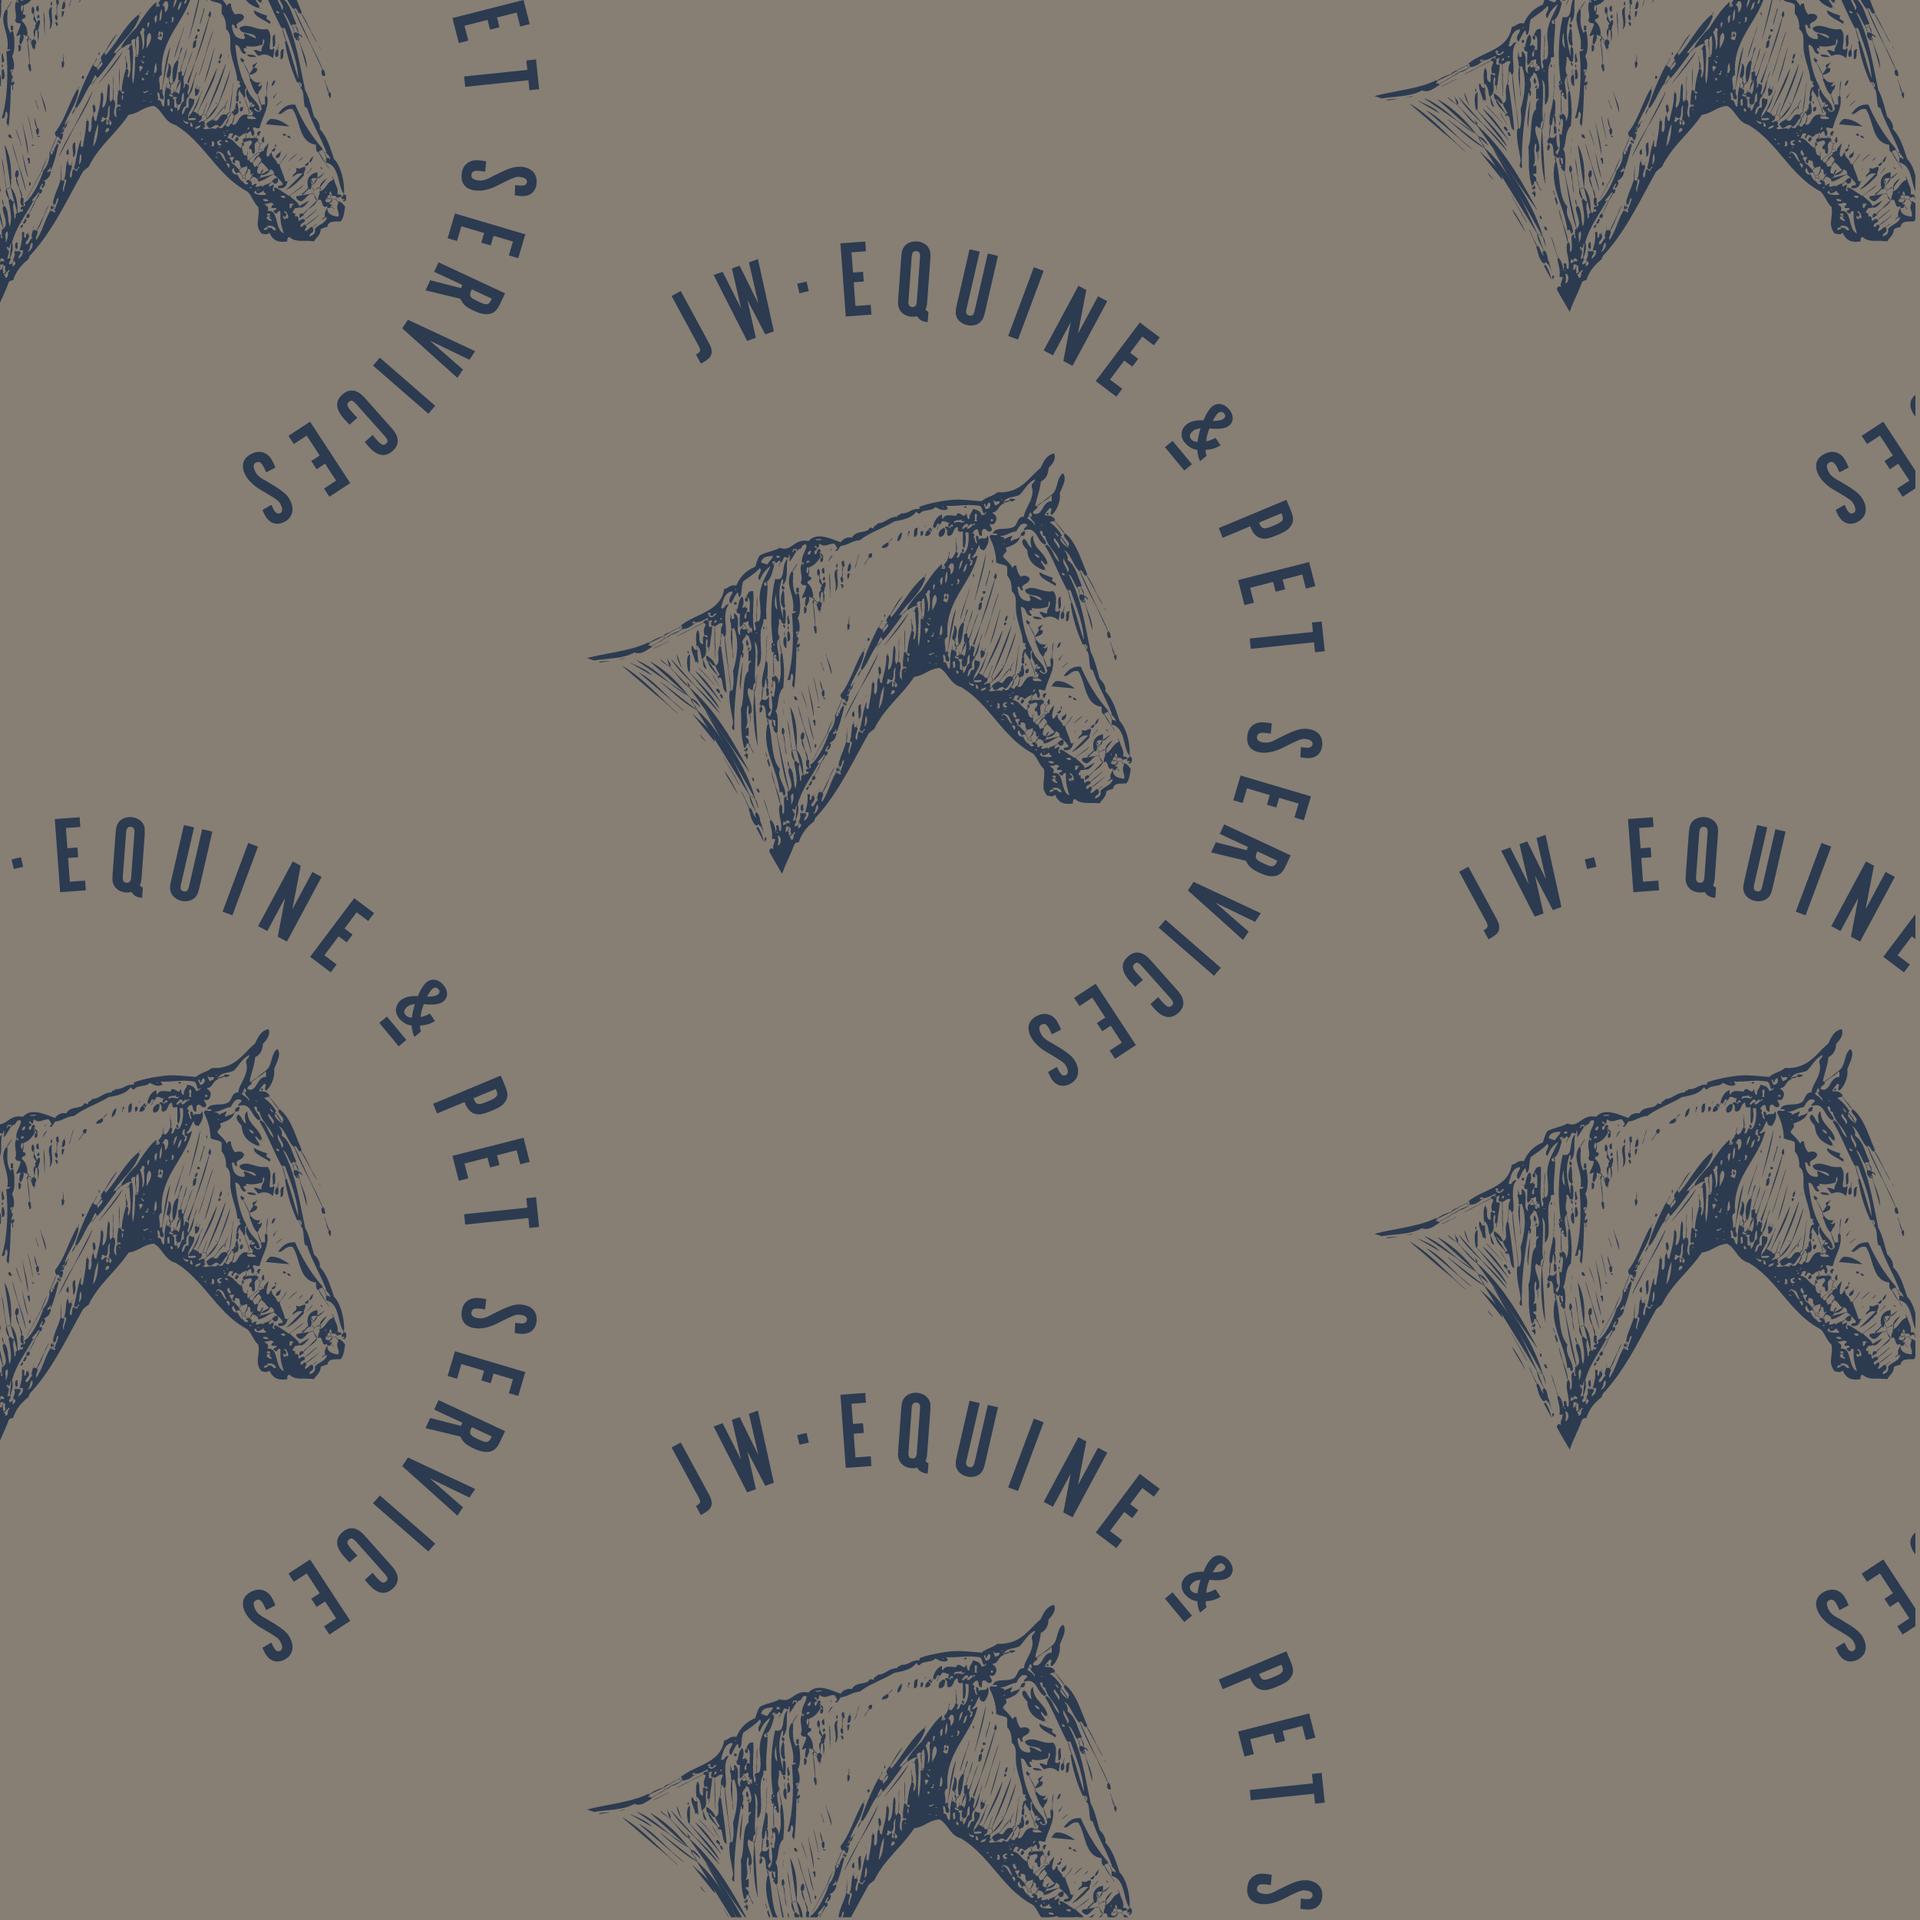 JW Equine Showcase-06.png